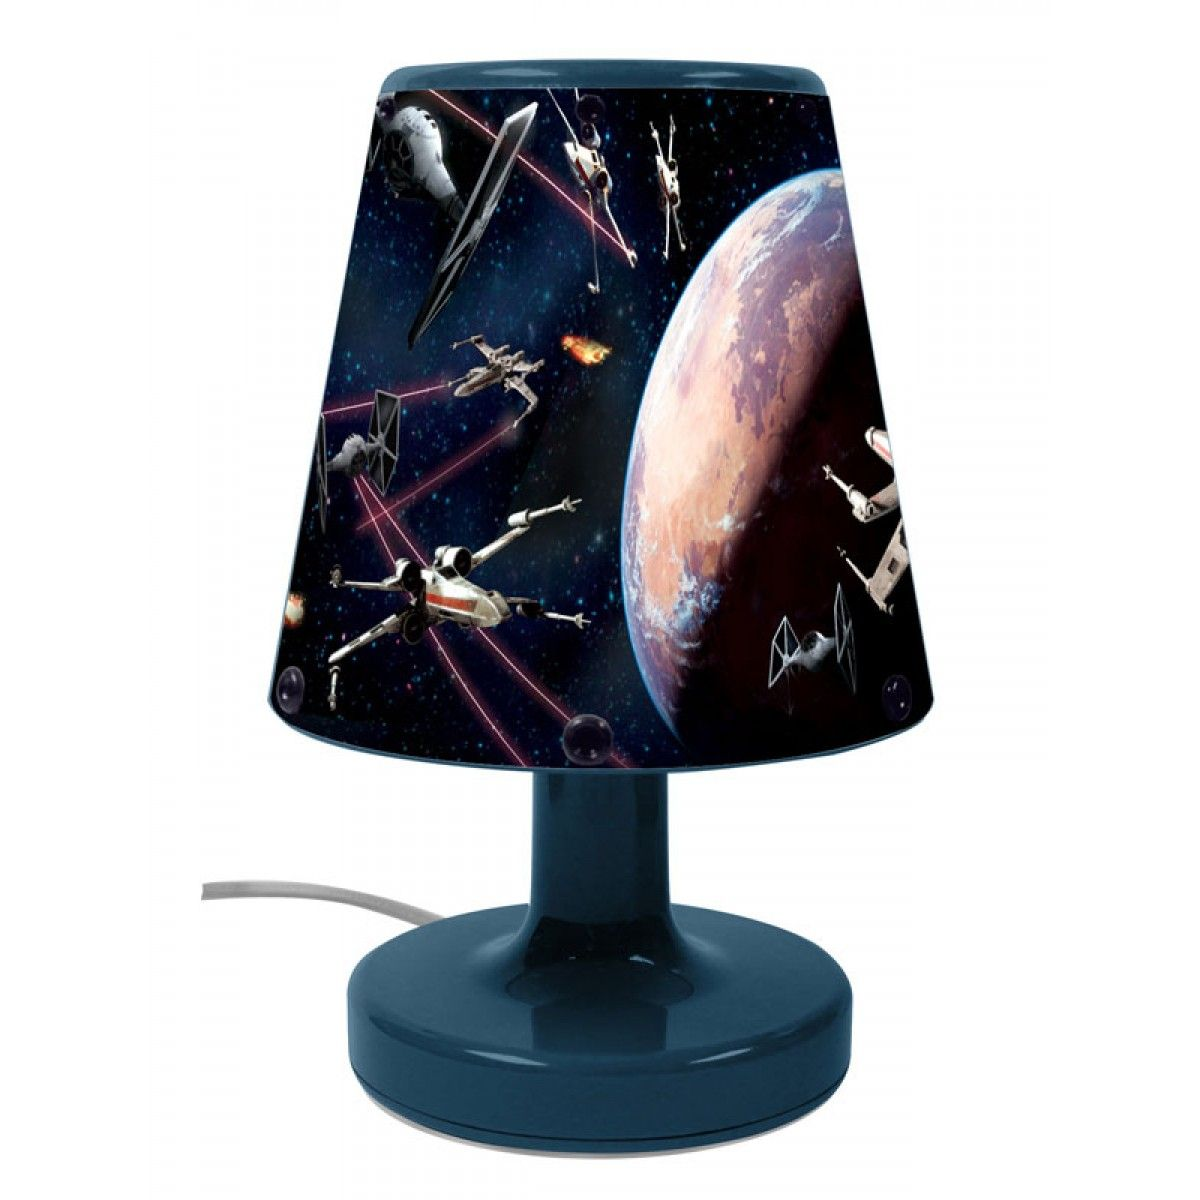 Star Wars Tapered Ceiling Light Shade Star Wars Bedroom Star Wars Lamp Bedside Lighting